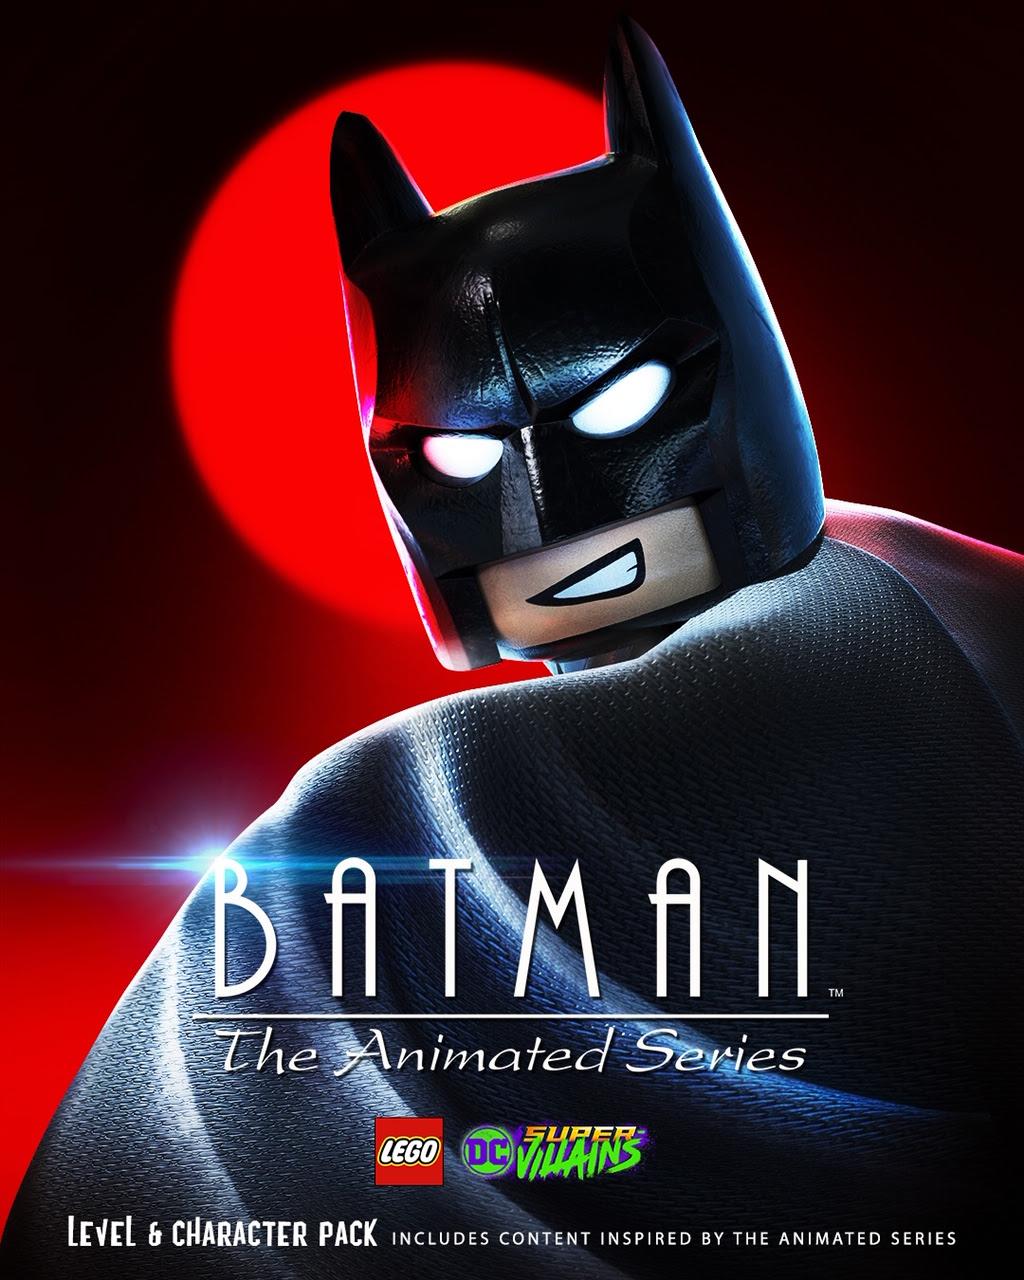 LEGO DC Super-Villains lanza el paquete de nivel de Batman The Animated Series, GamersrD